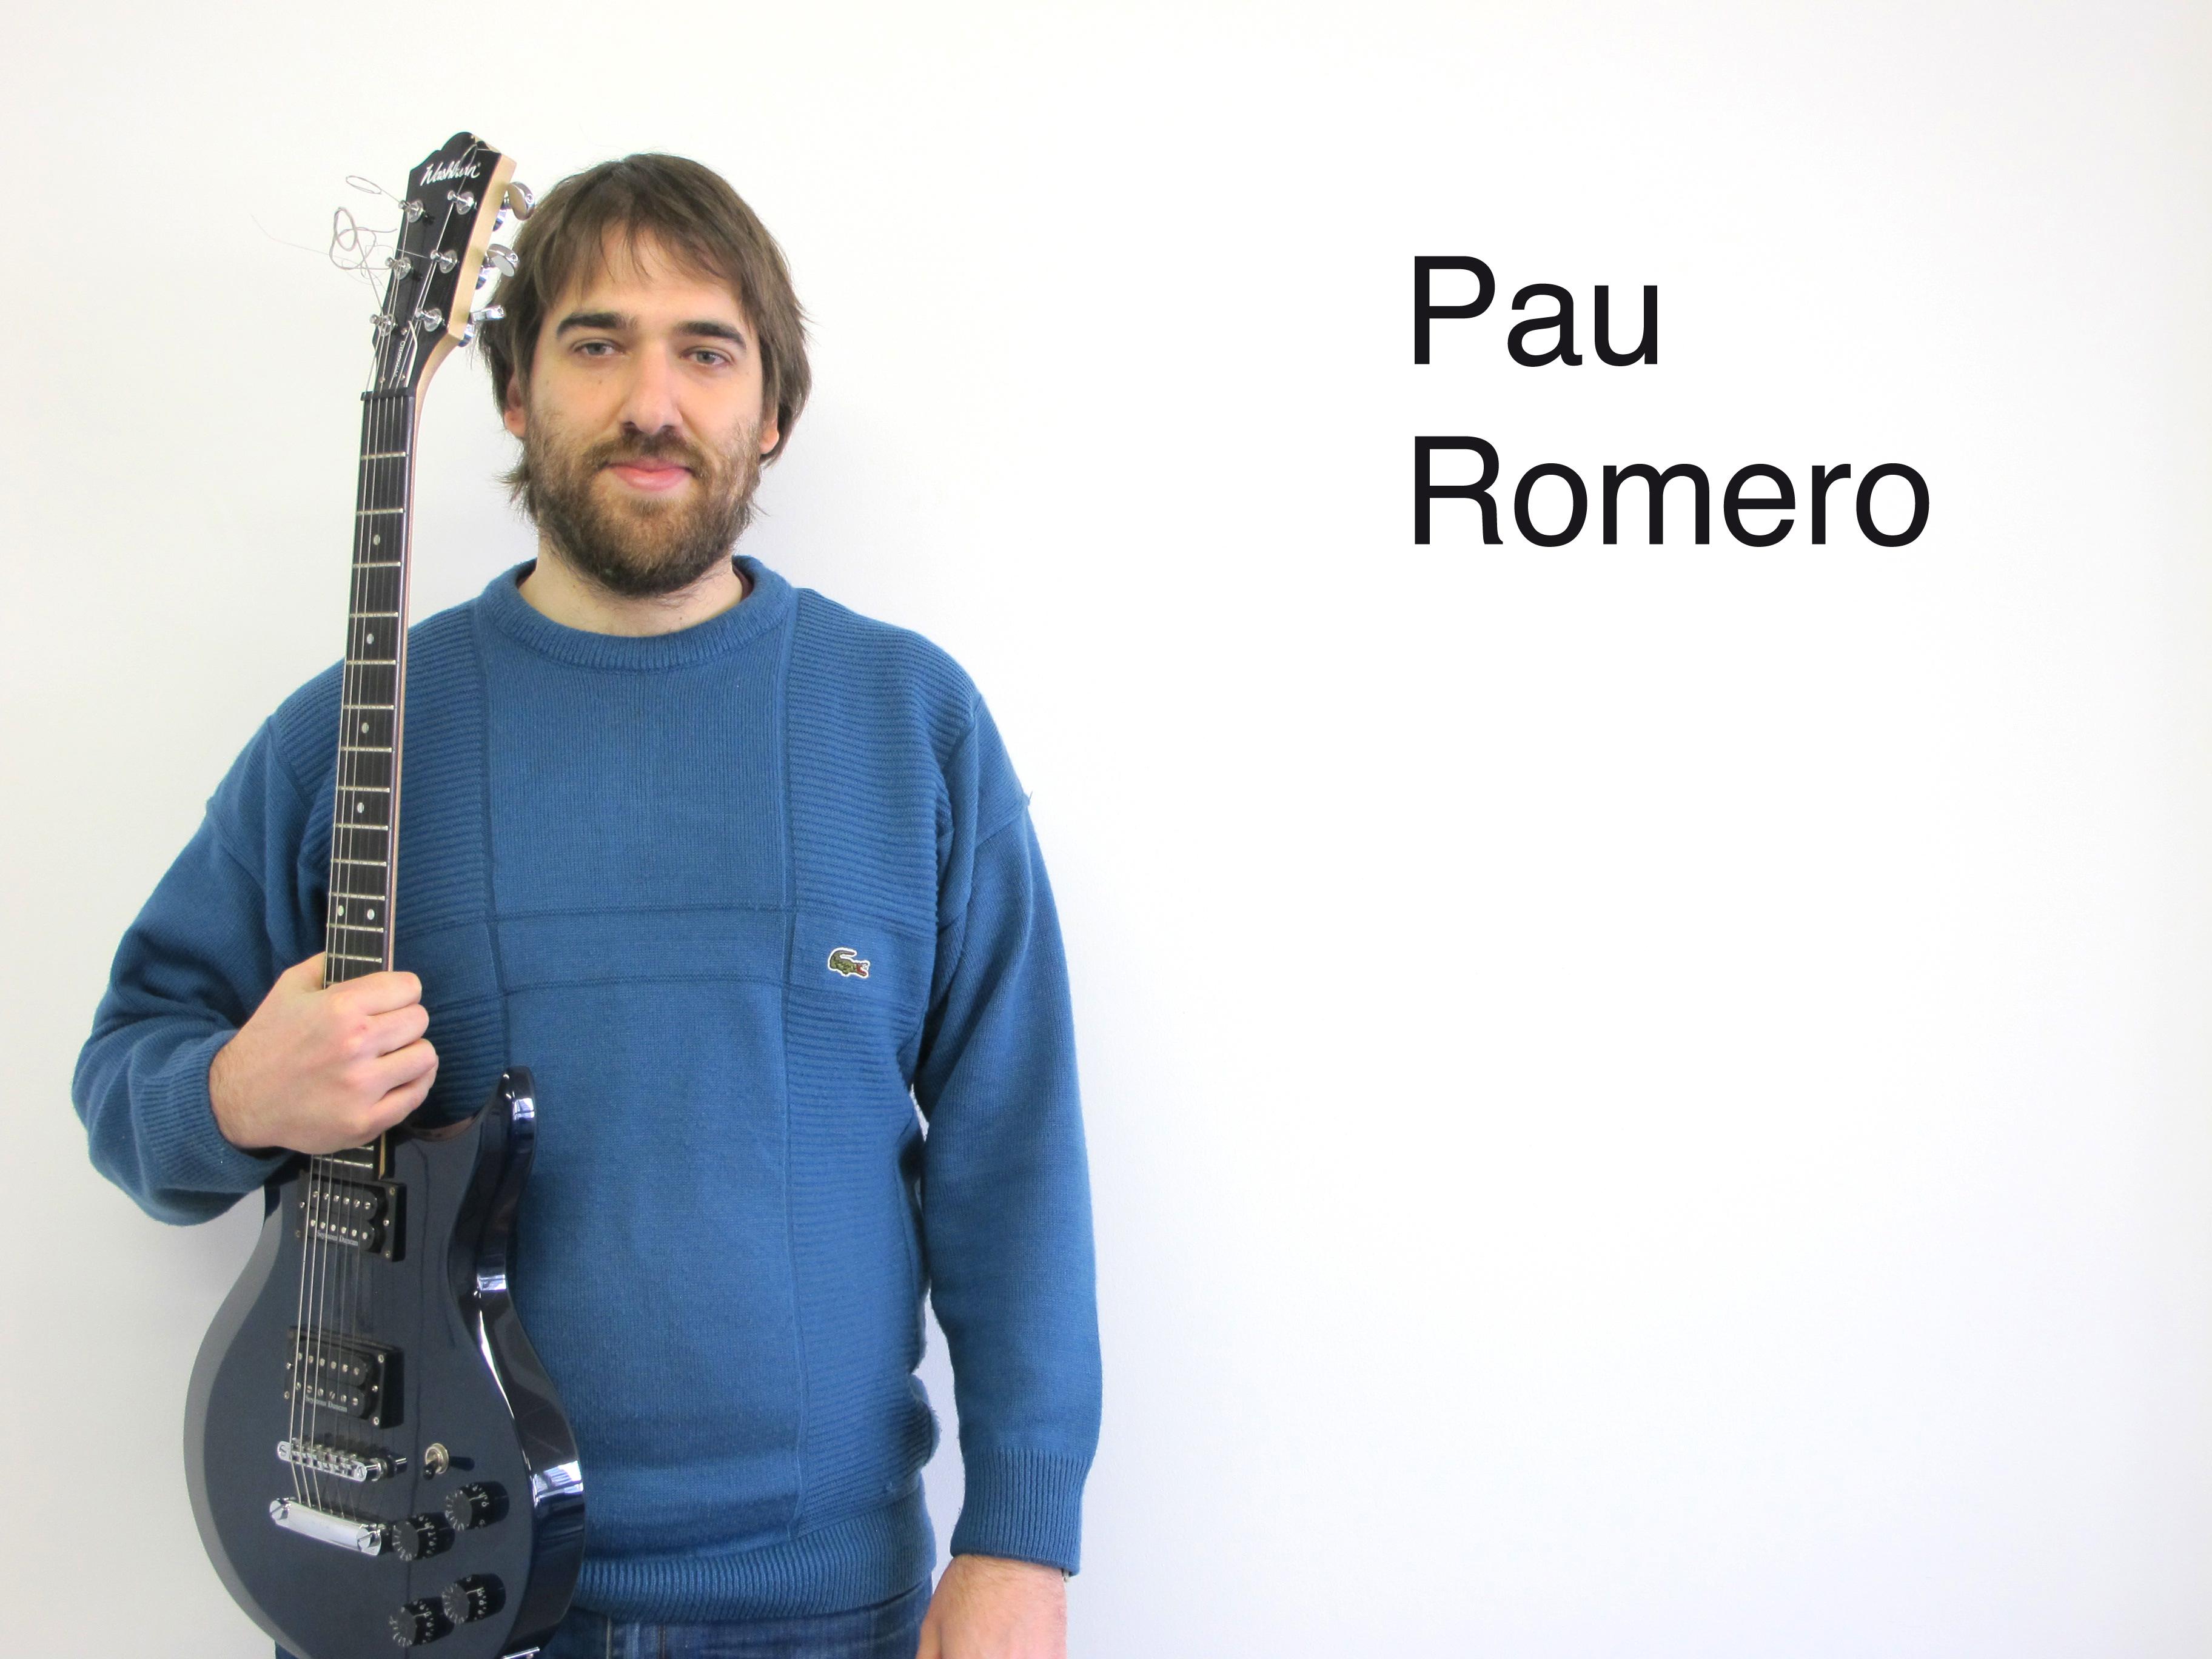 Pau Romero